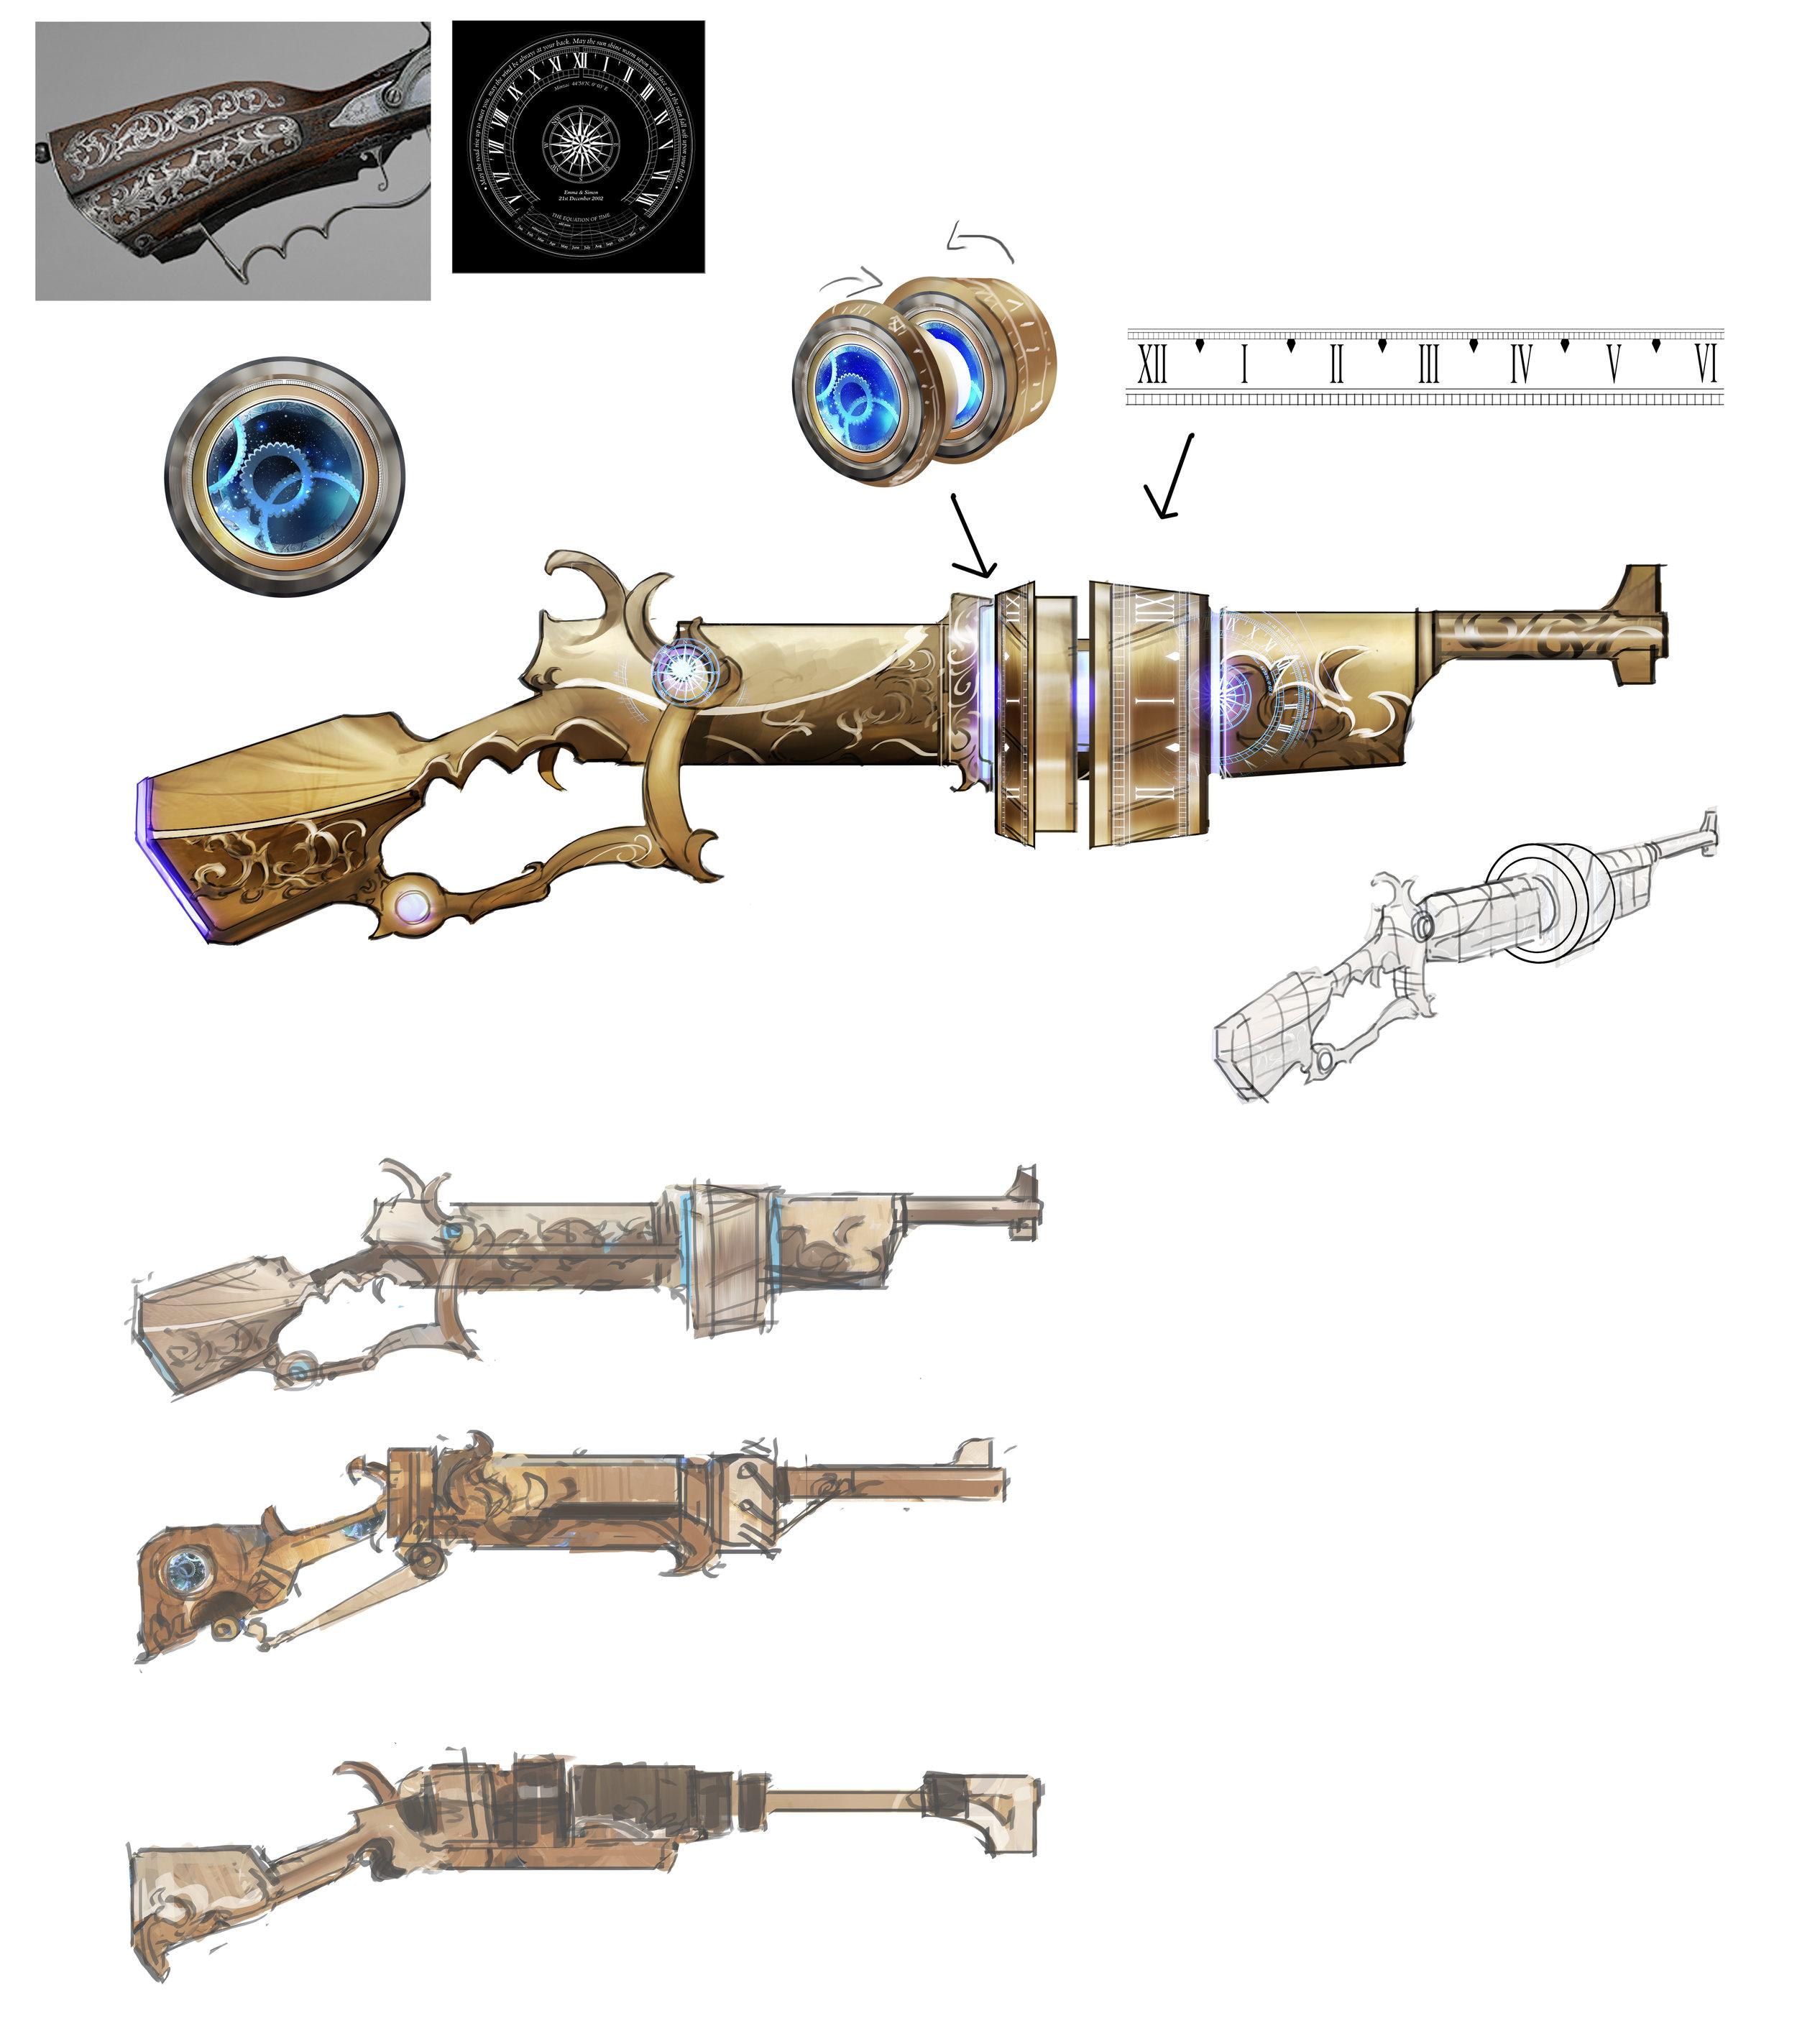 TimeKeeper_Rifle.jpg